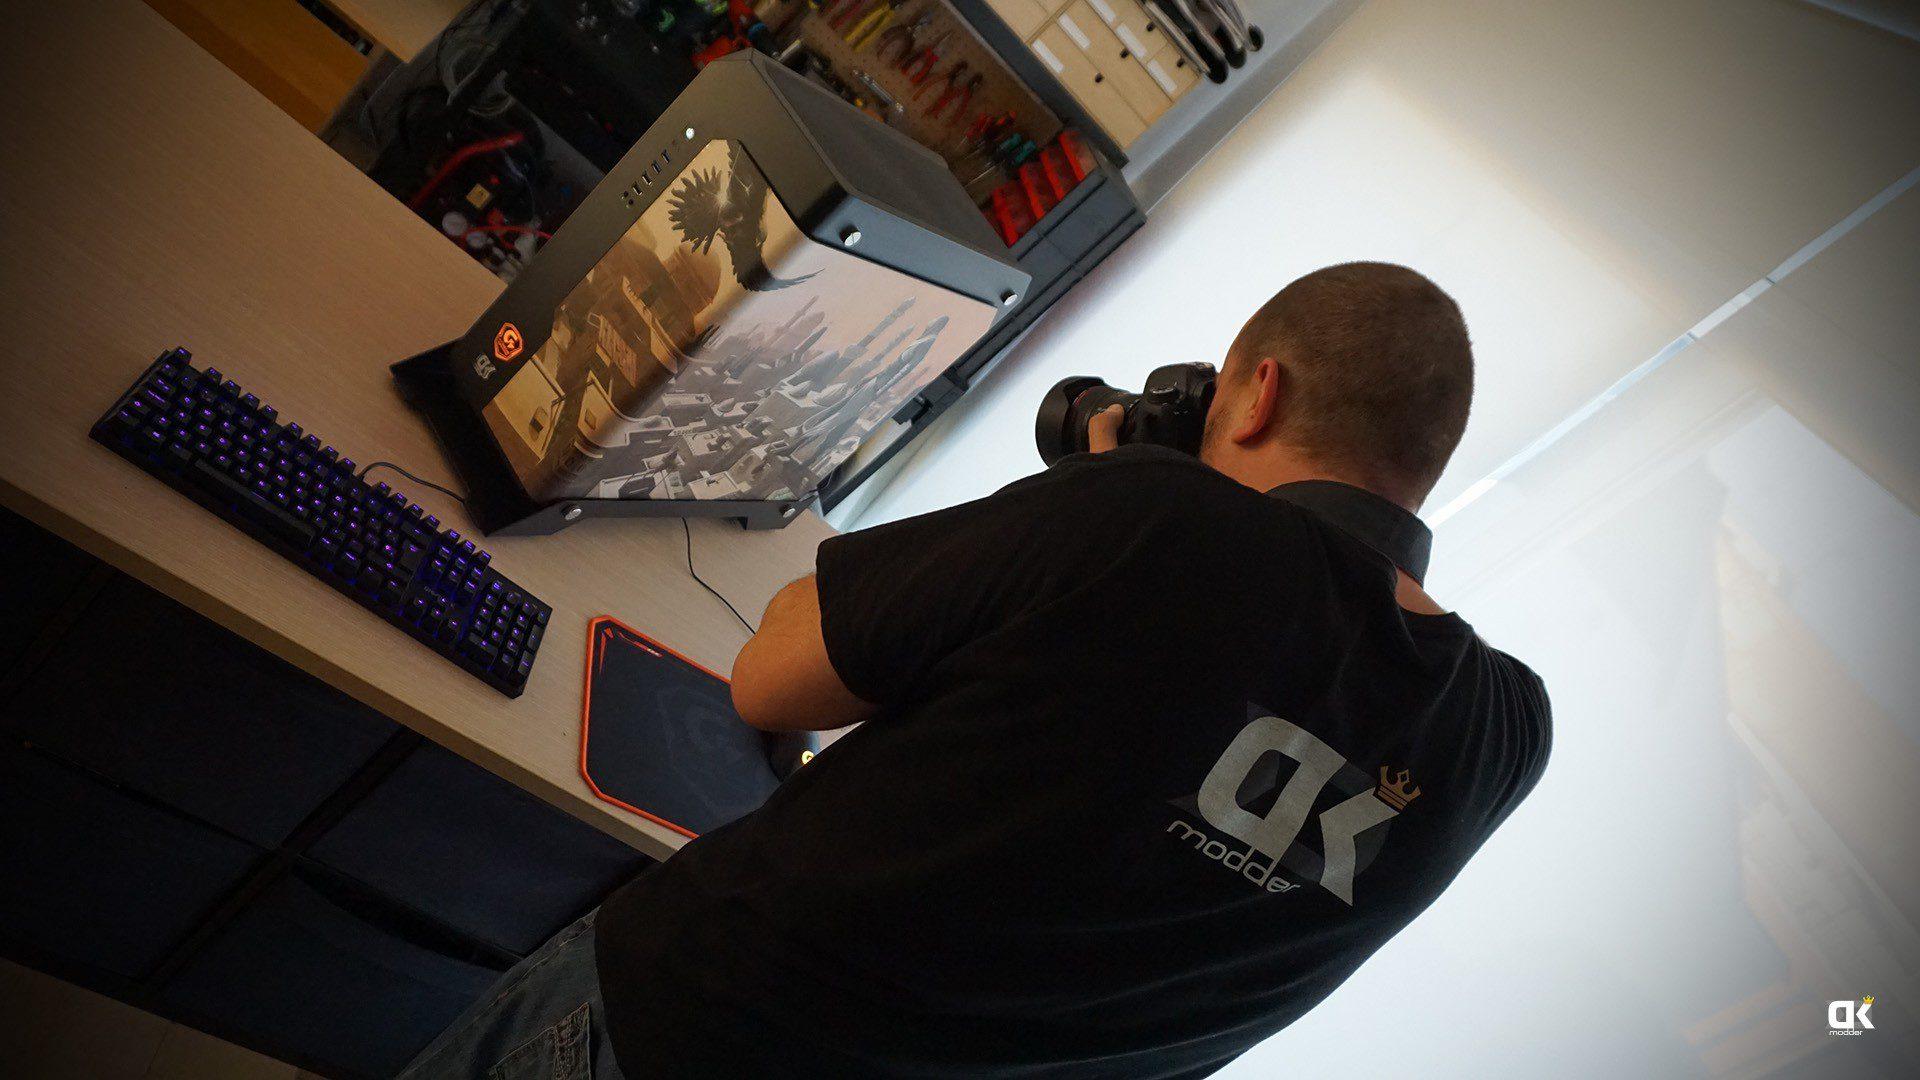 Gigabyte Xtreme PC, Assassin's Casemod by DeKa modder